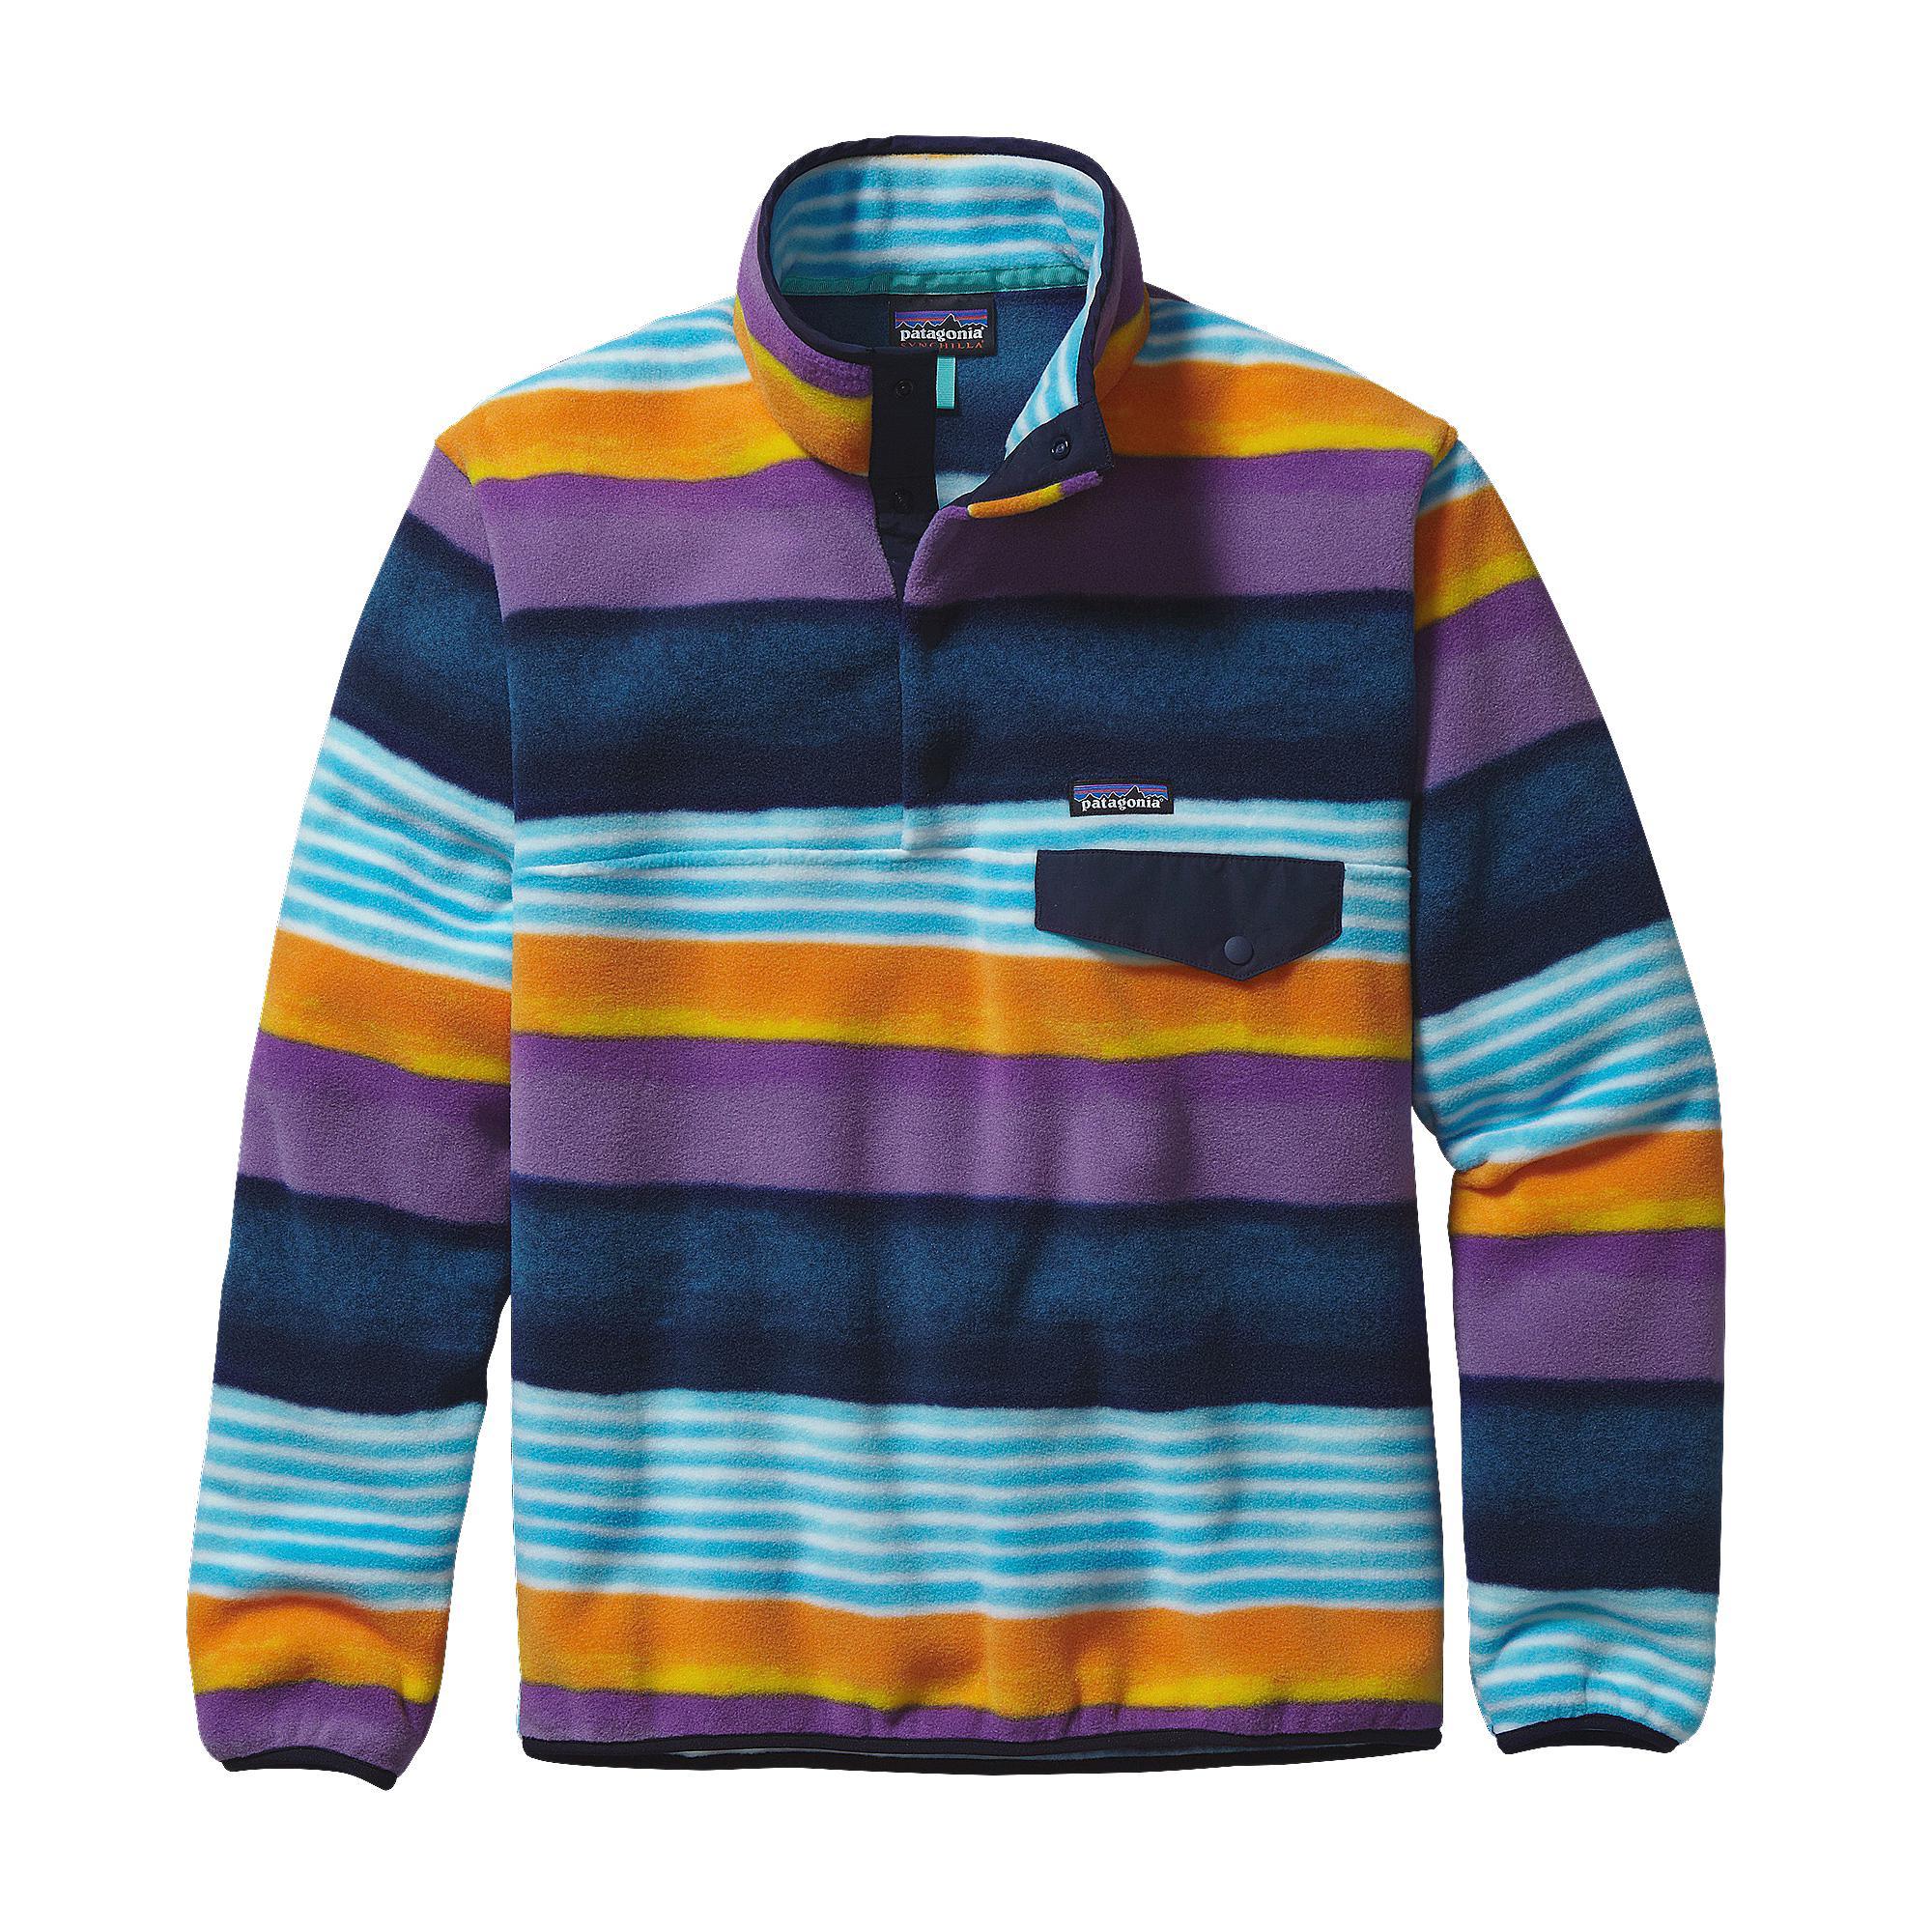 Bluza polarowa Lighweight Synchilla Snap-T Fleece Pullover marki Patagonia